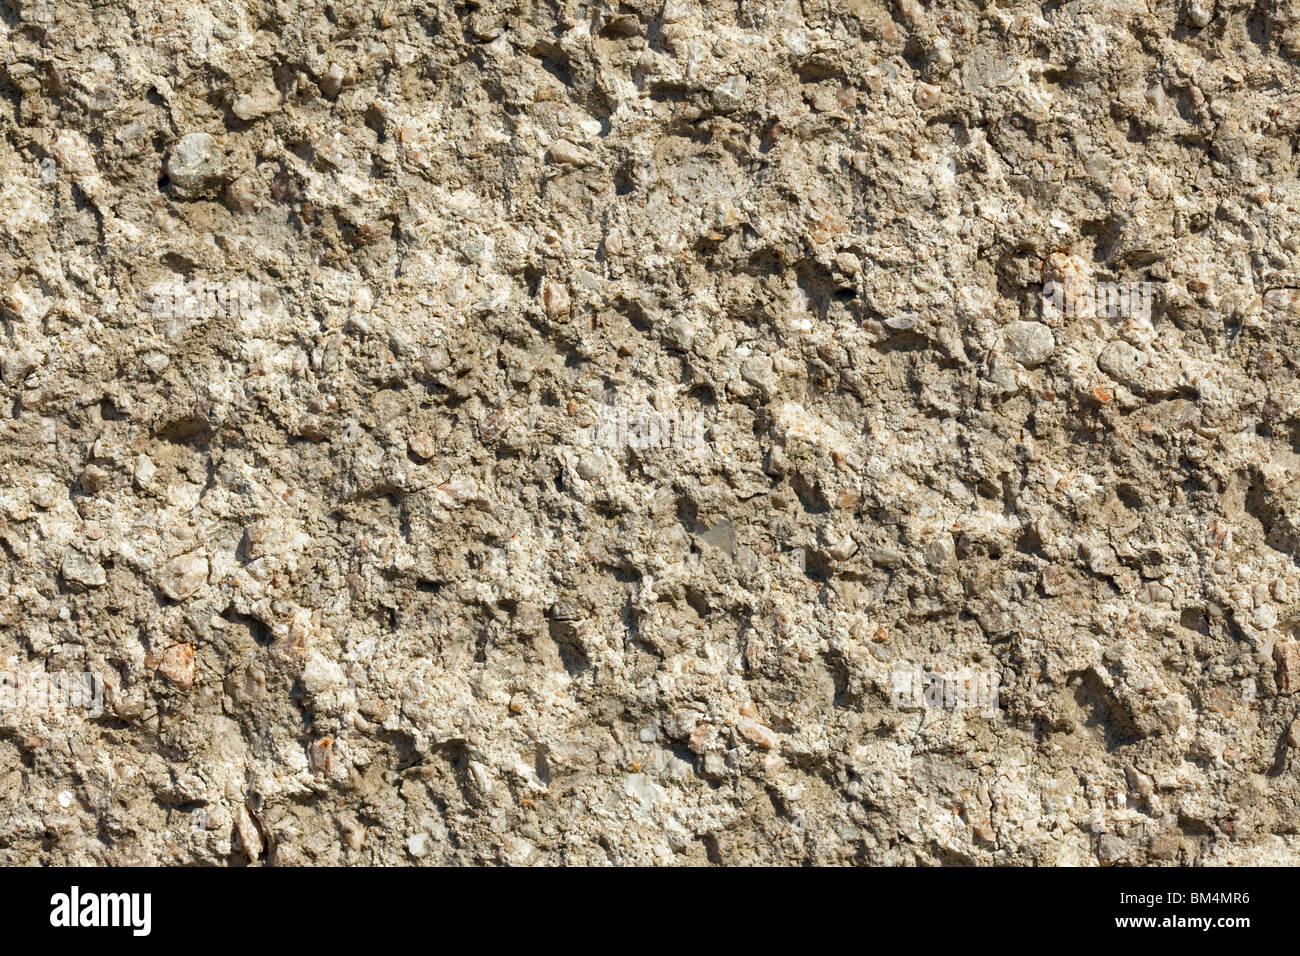 Fotografía tomada de textura de pared Imagen De Stock